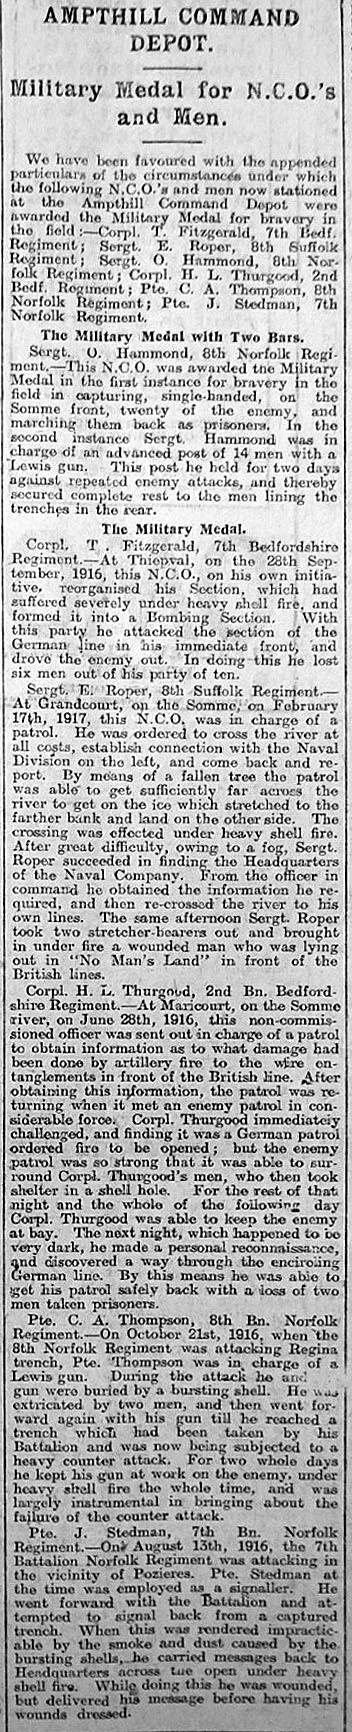 Bedfordshire Standard - August 31, 1917